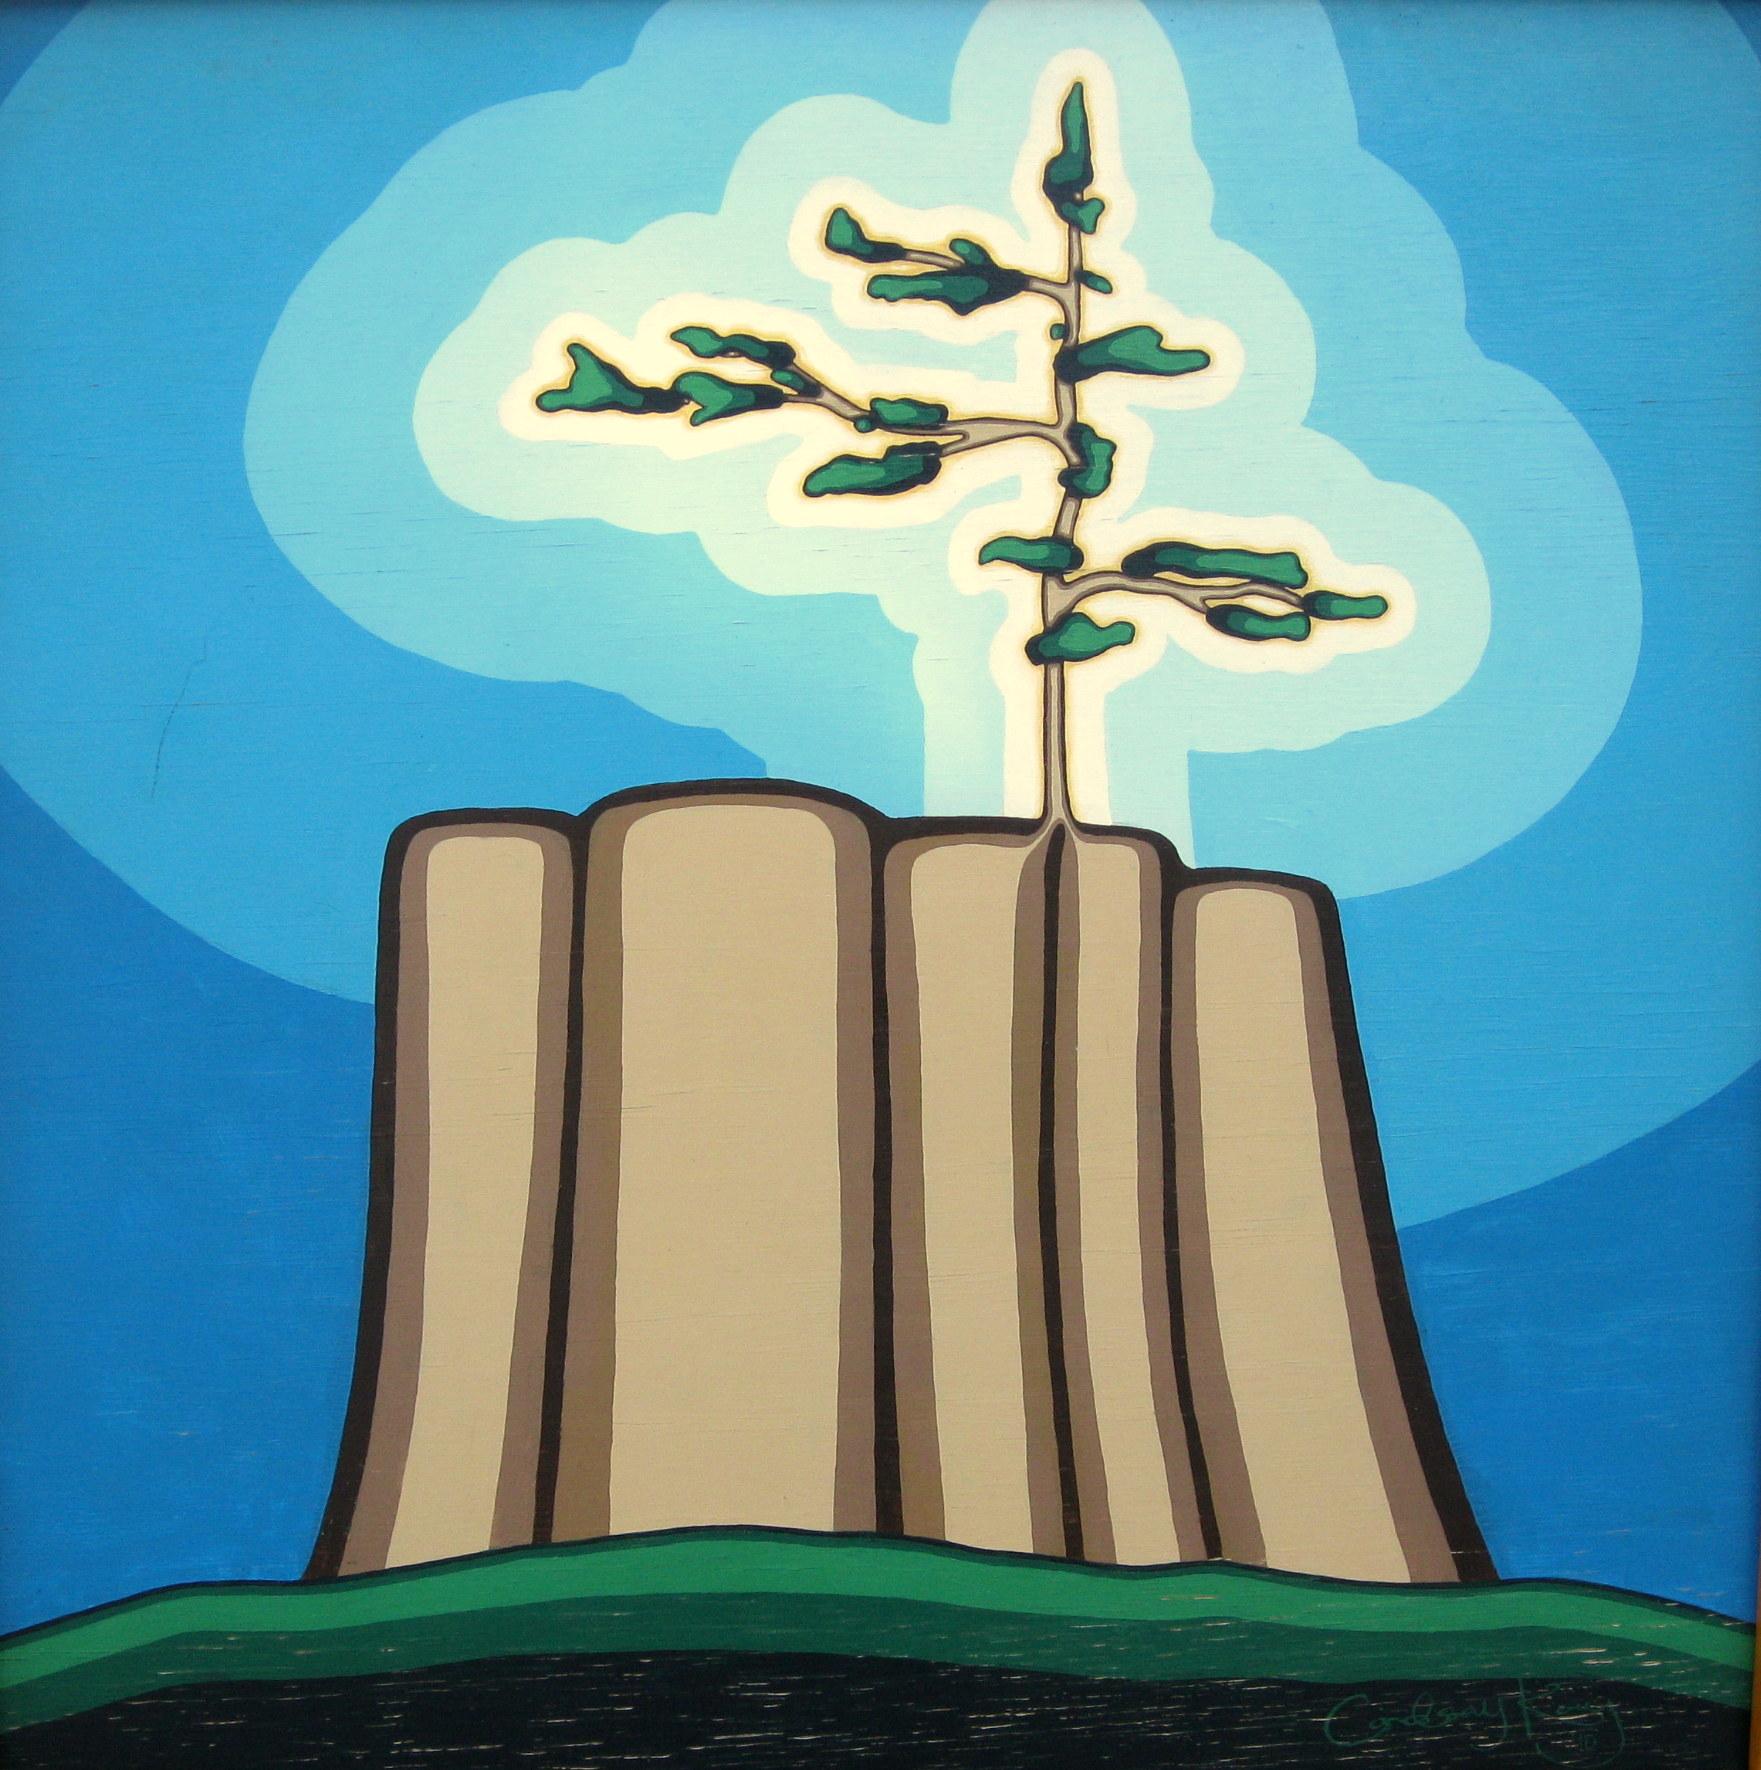 tree stump, sapling, vibrational art